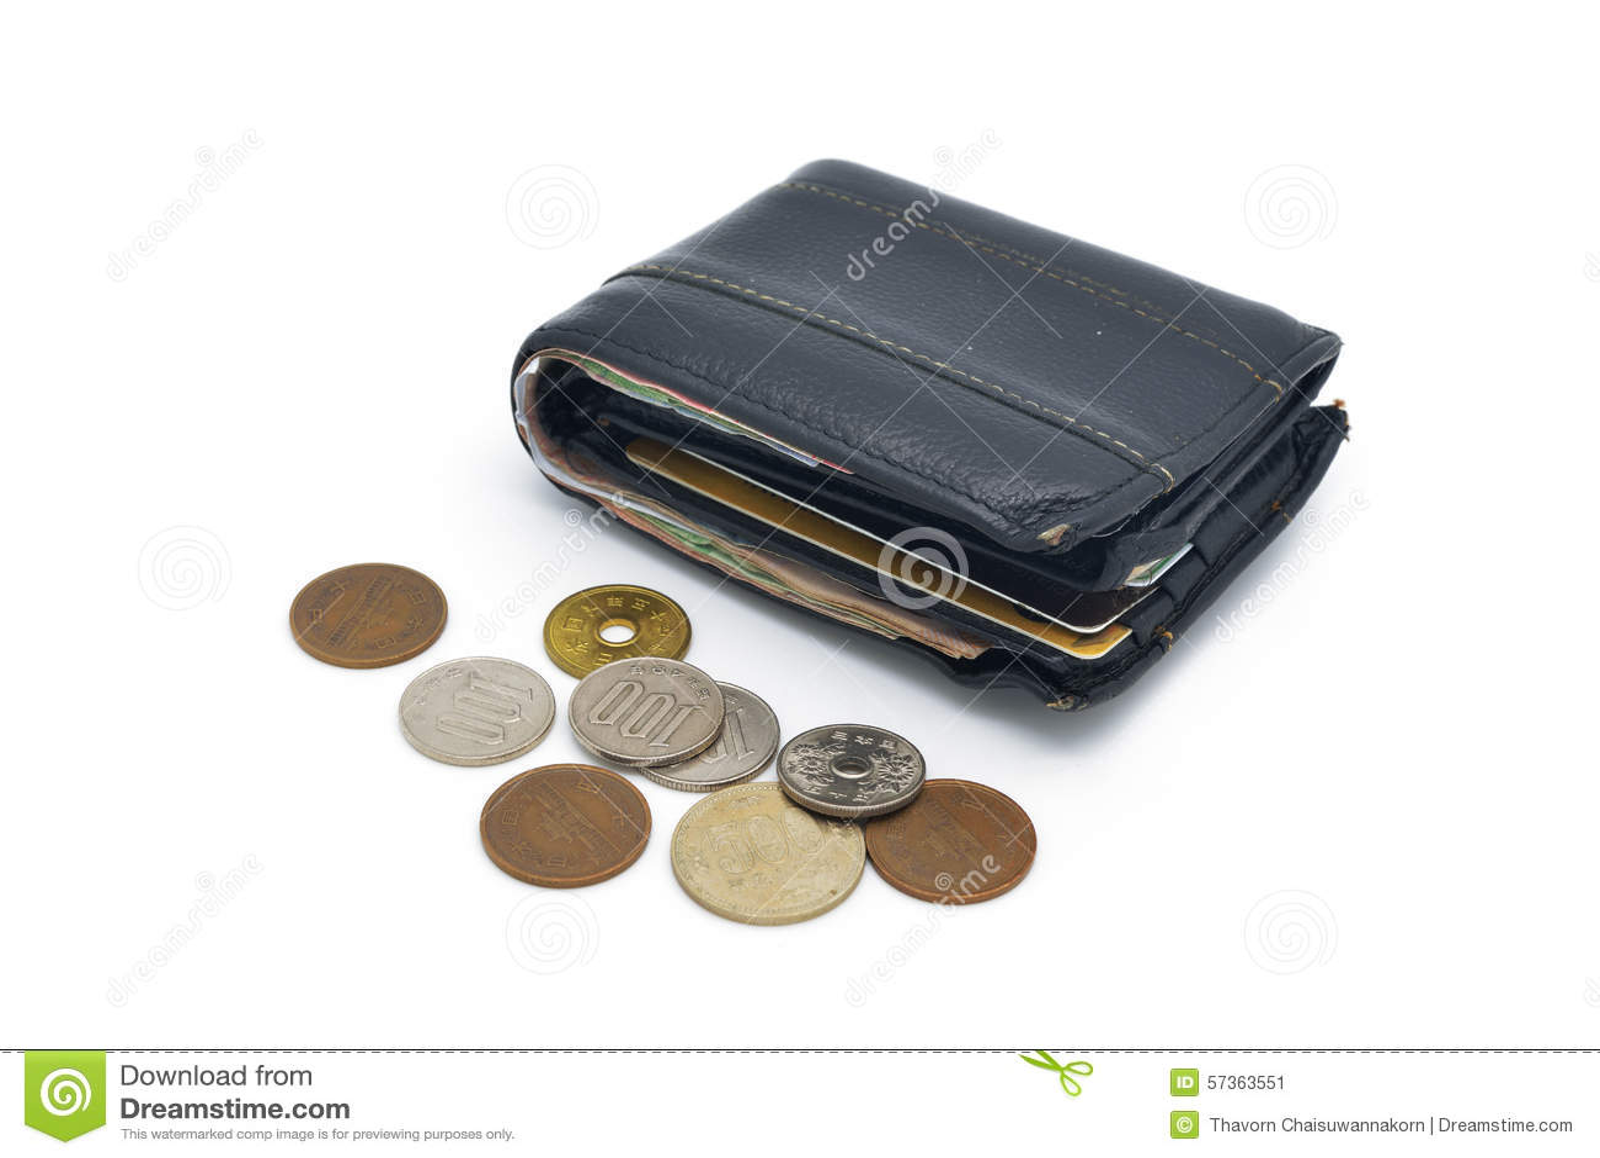 Cartera y monedas de cuero usadas viejas aisladas